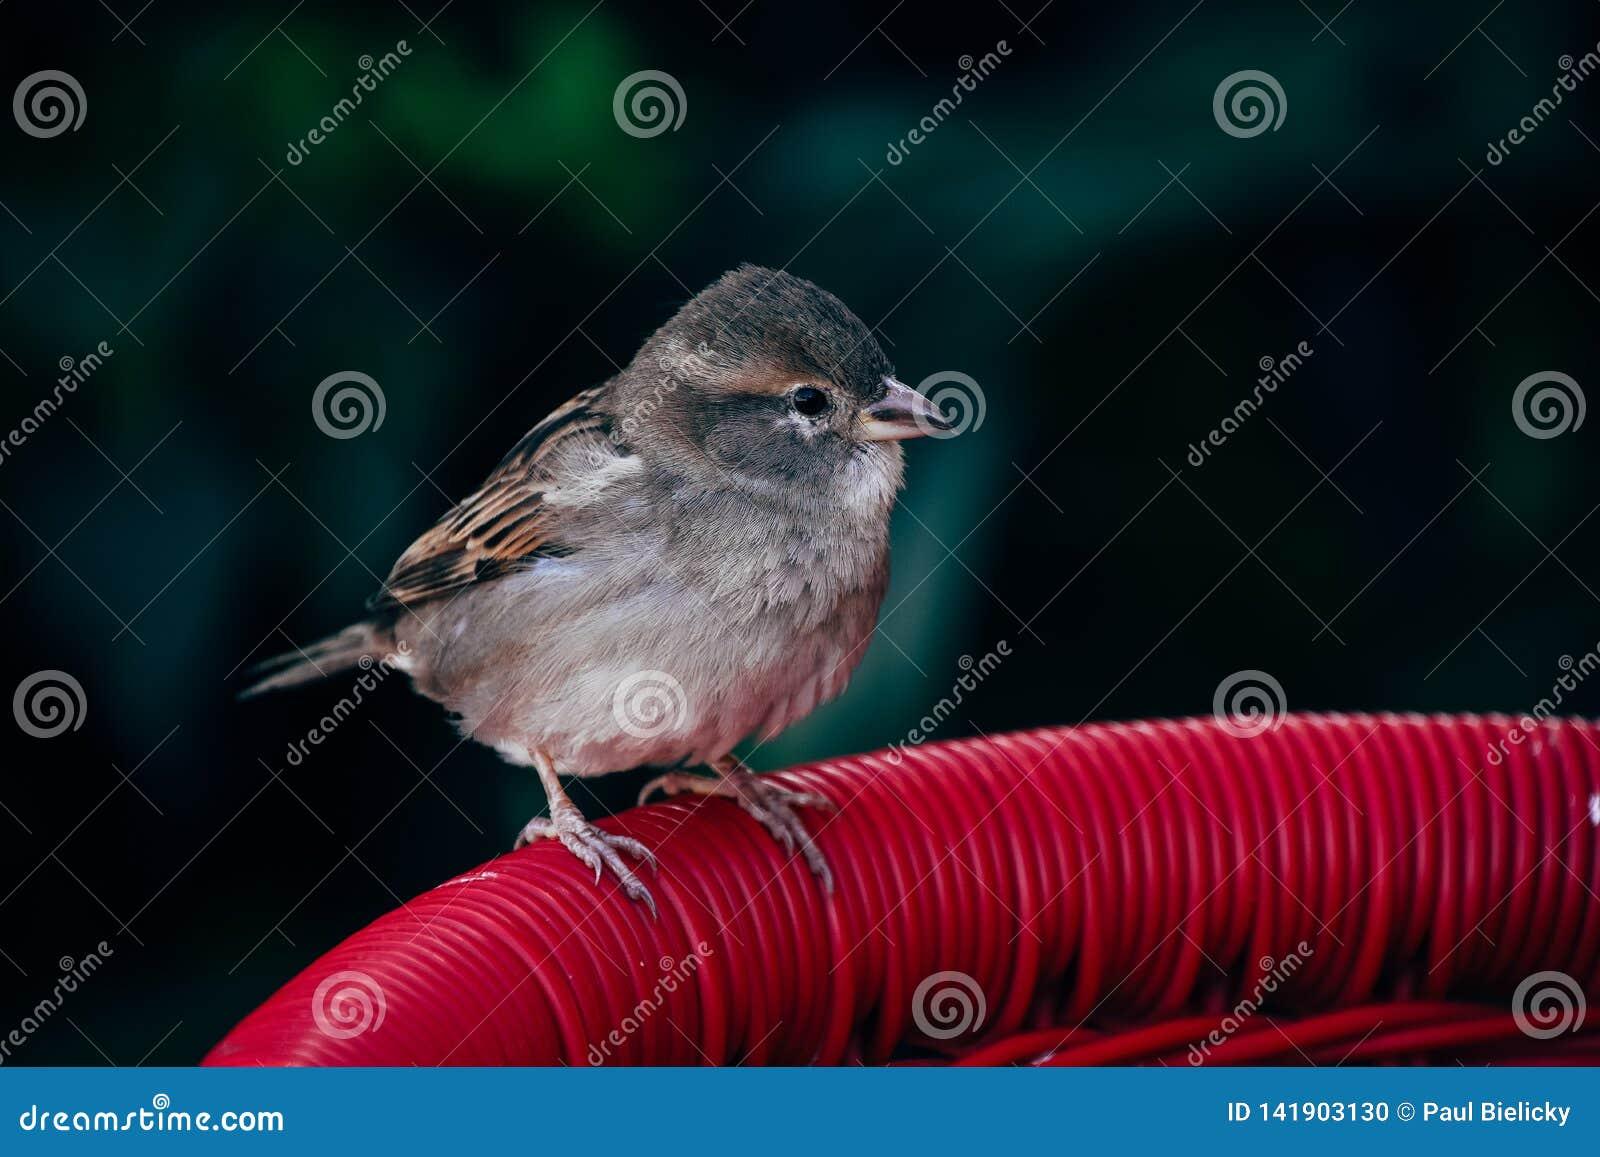 A small sparrow sits on a chair in Varedaro, Cuba.